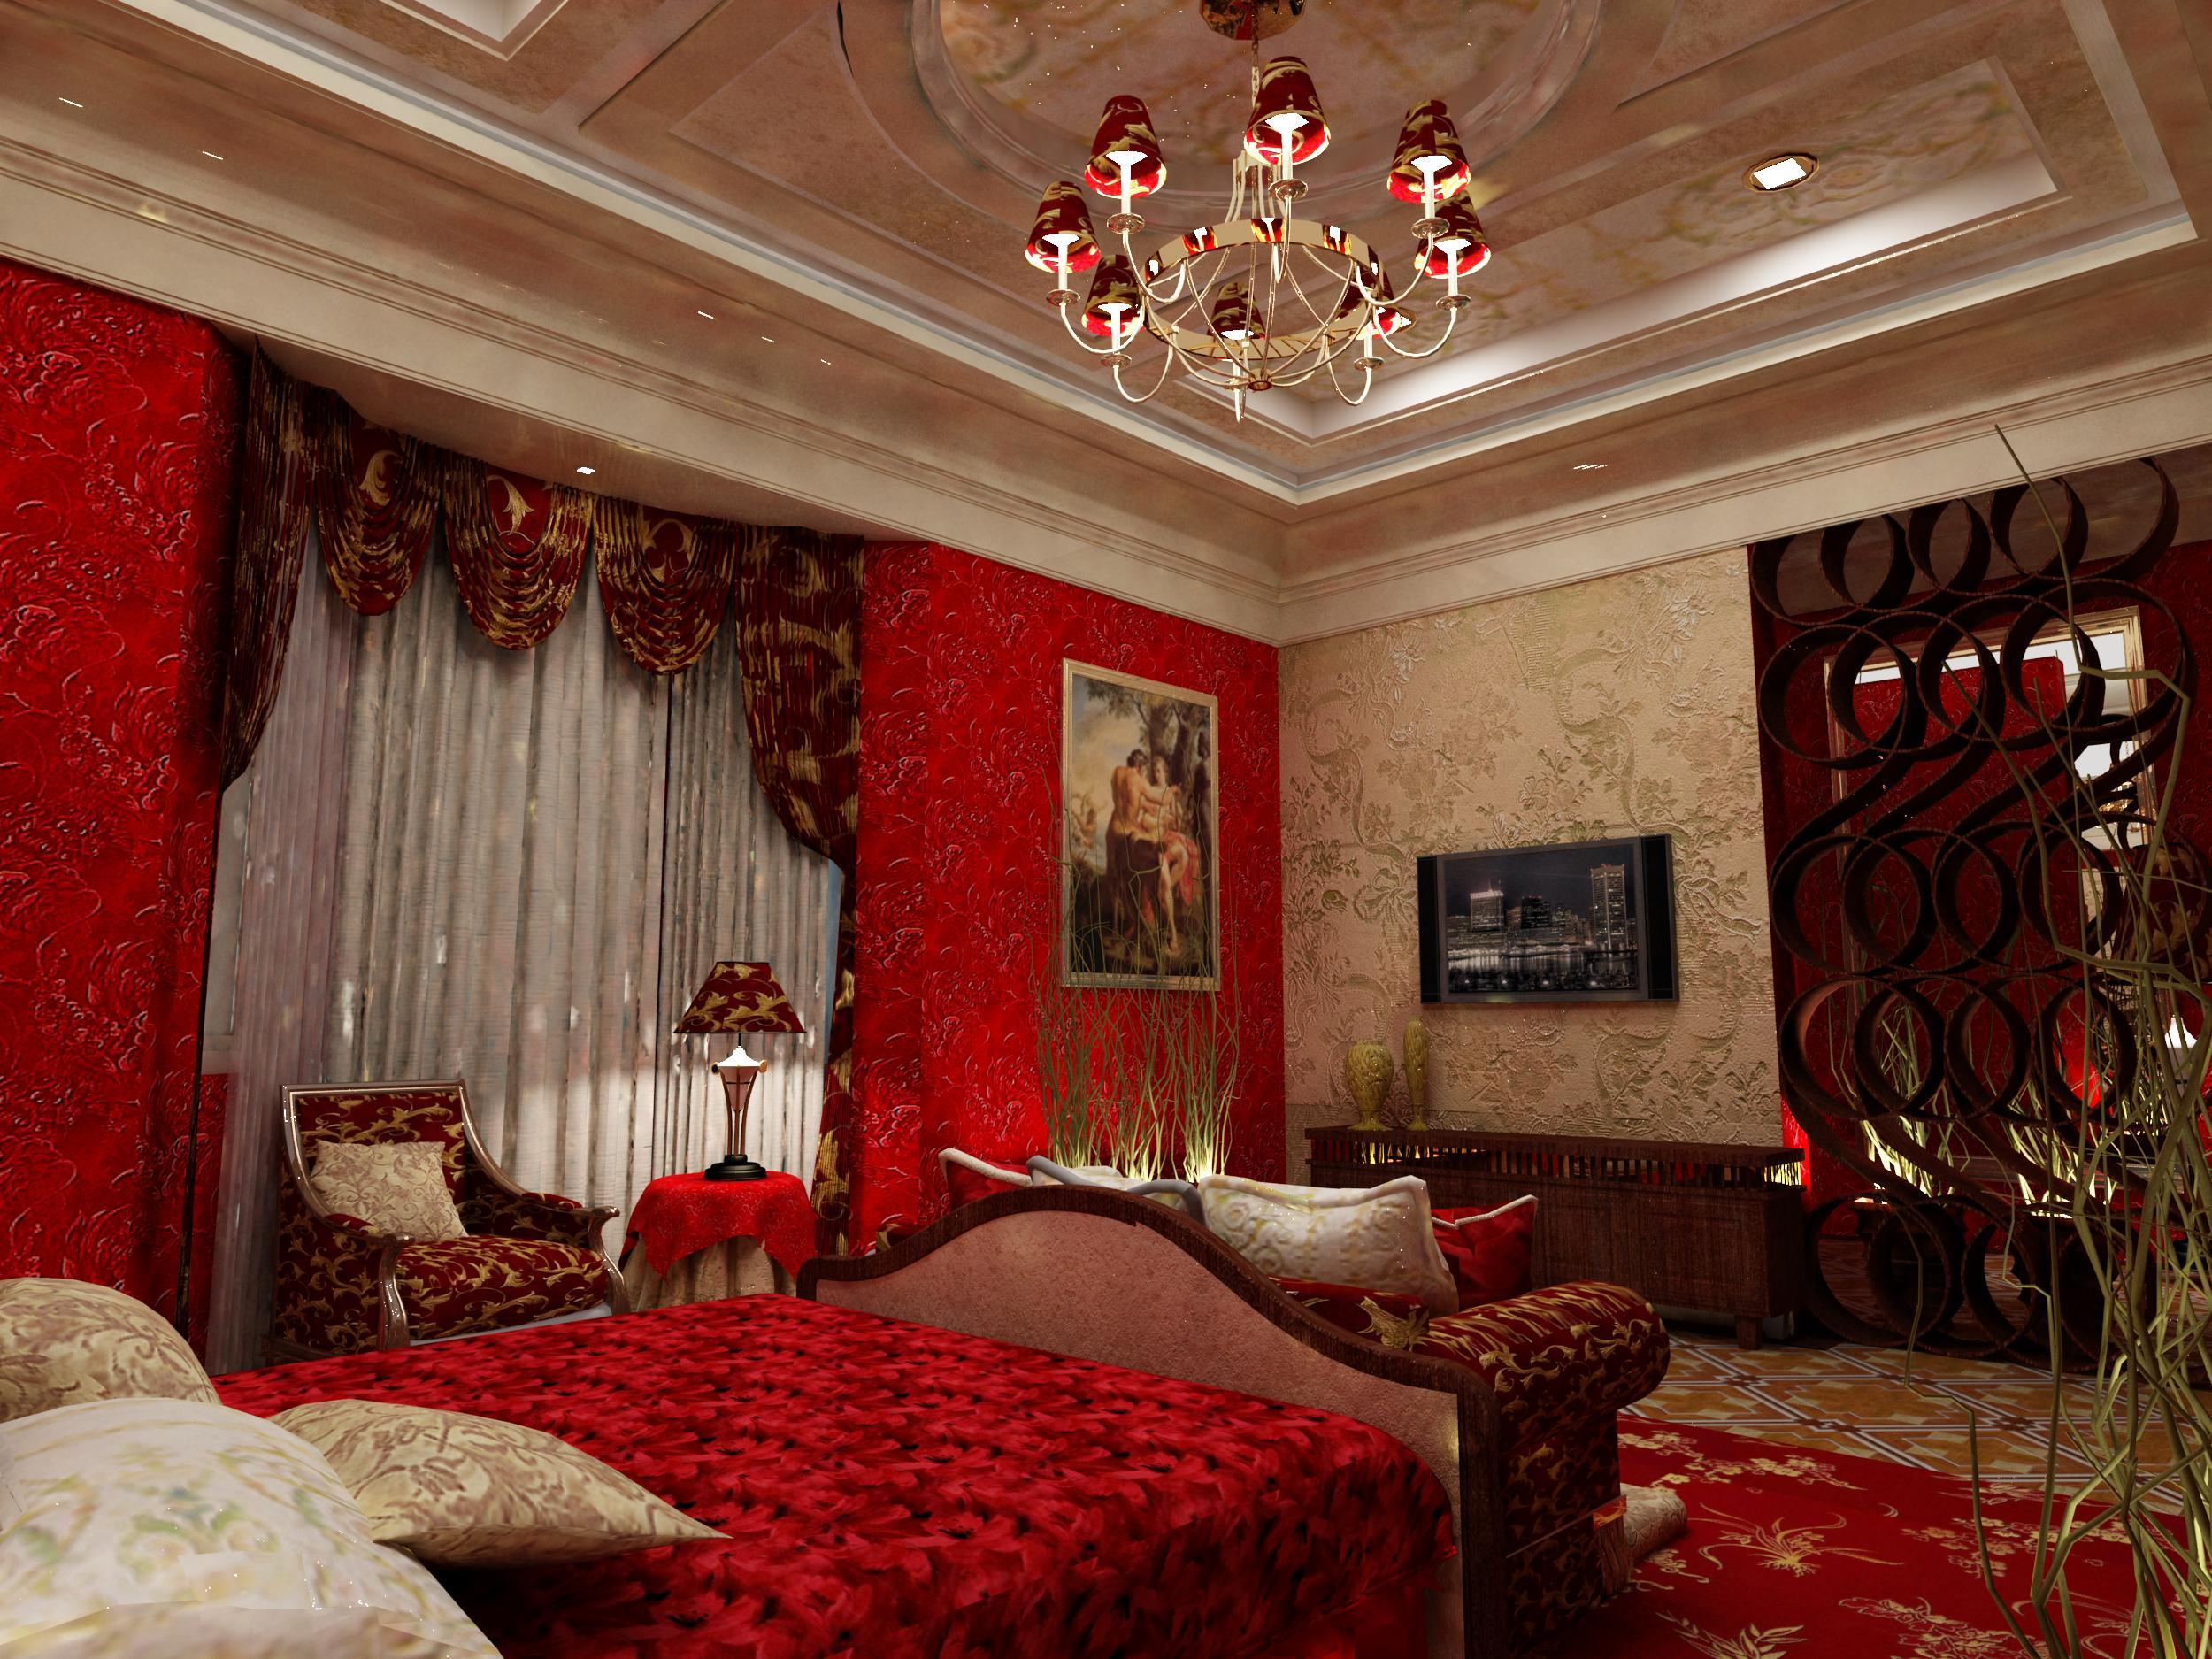 Hose dizain joy studio design gallery best design - Home dizain interior ...